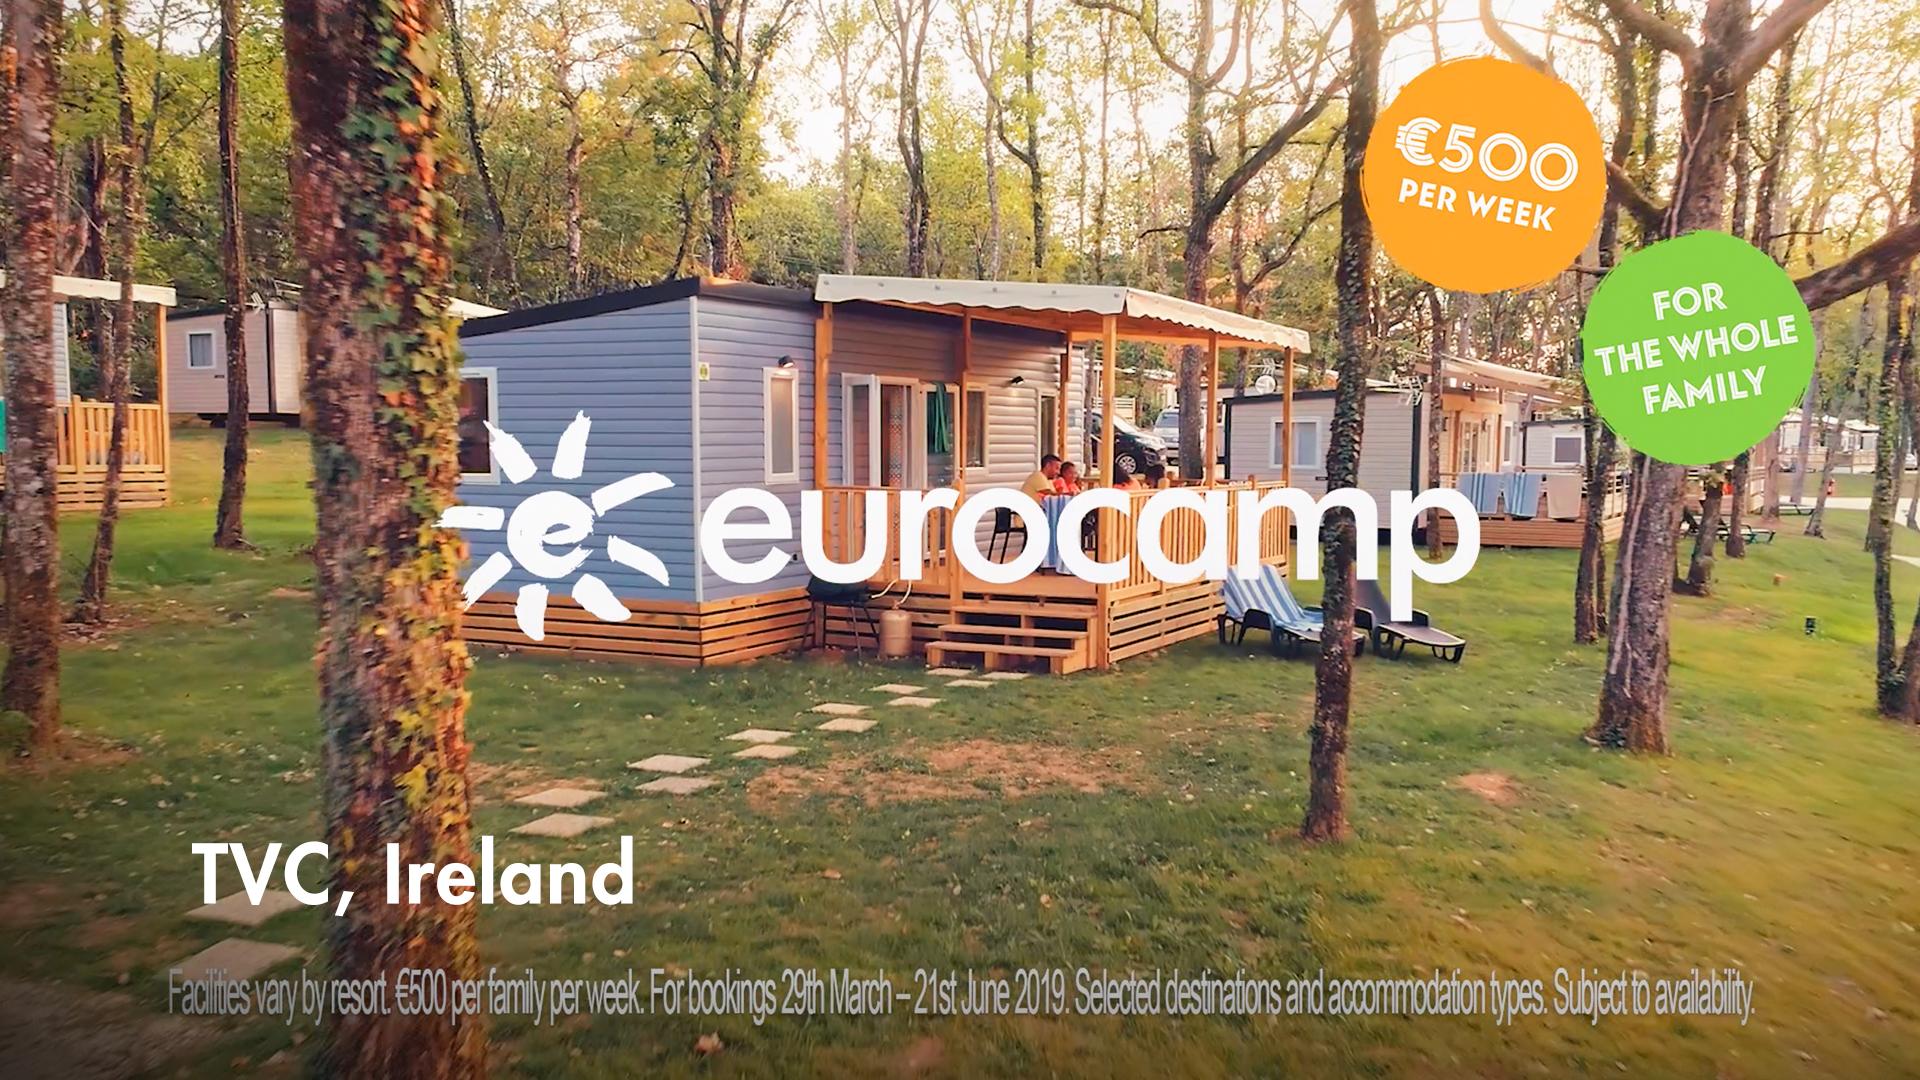 EUROCAMP TVC Ireland.jpg